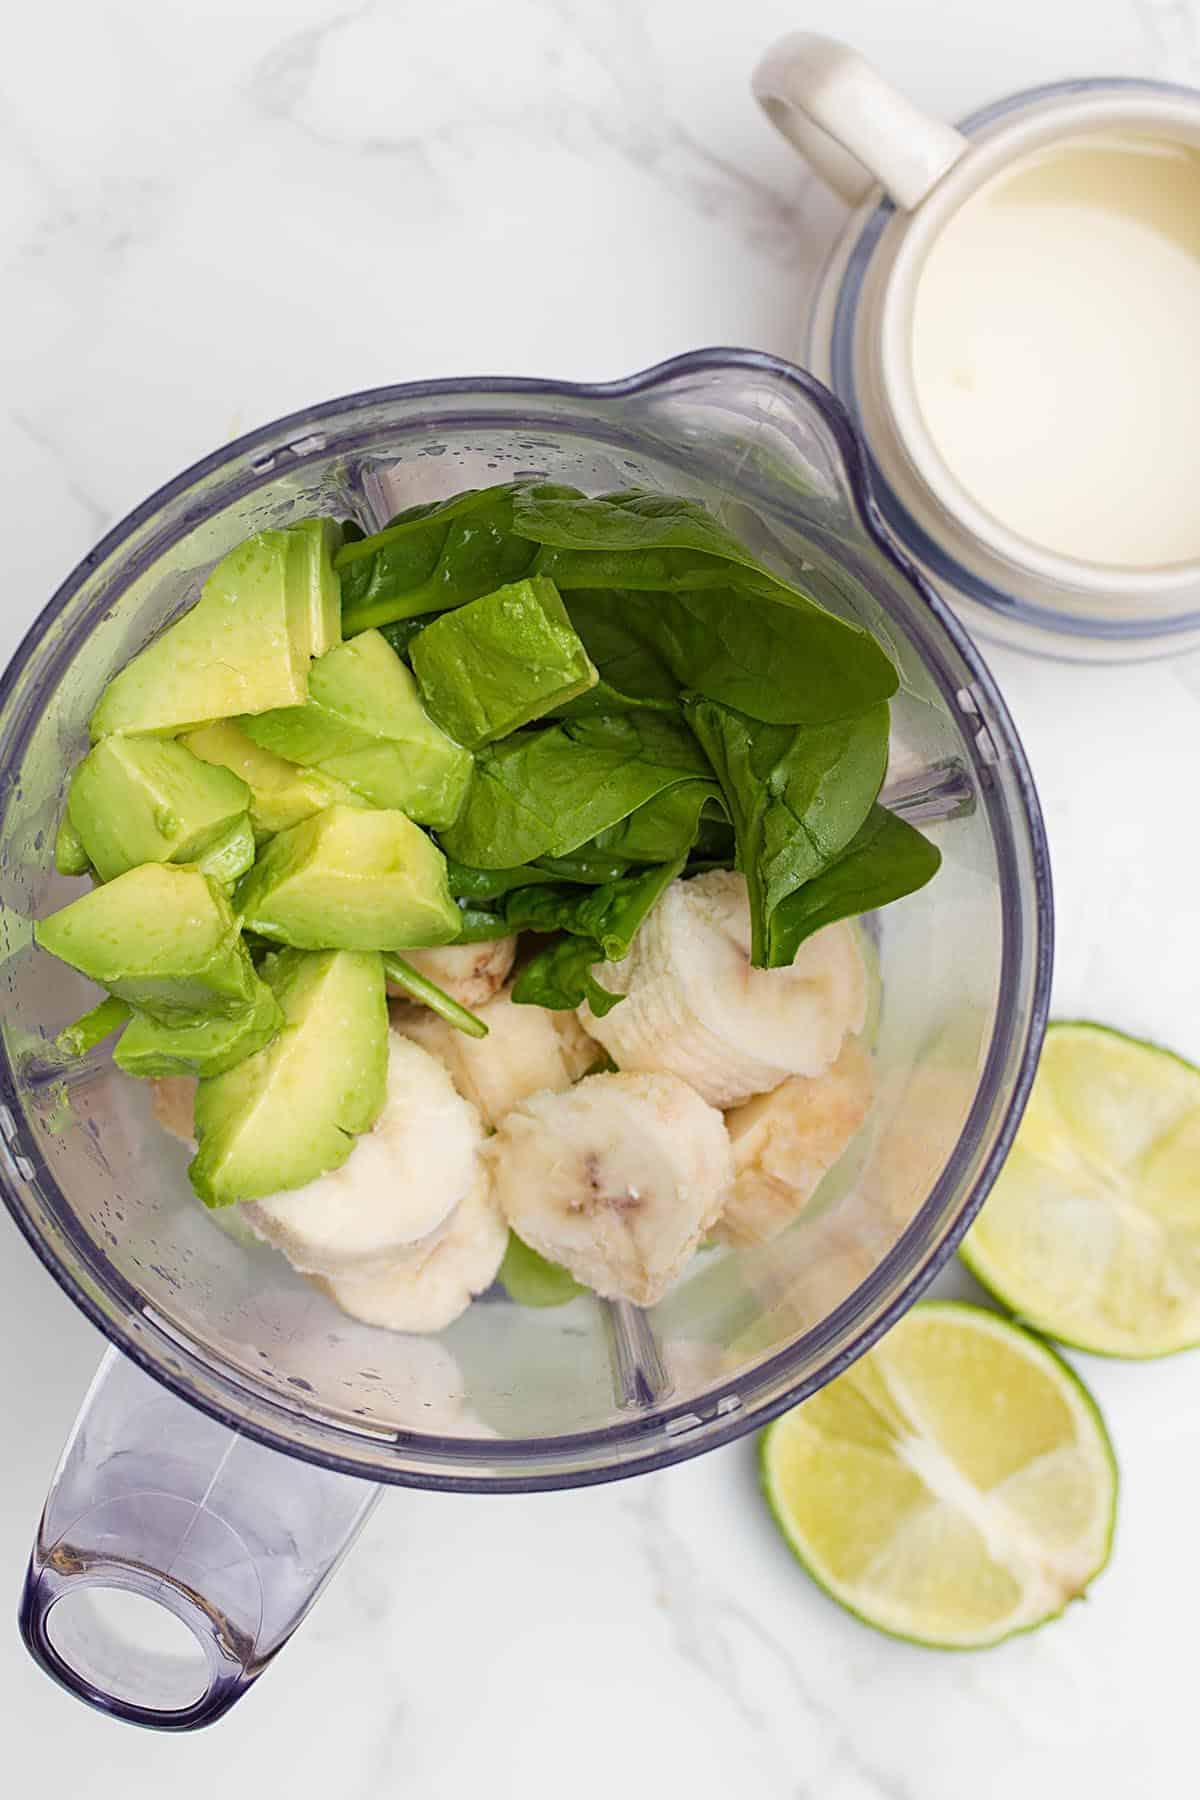 avocado and bananas in blender